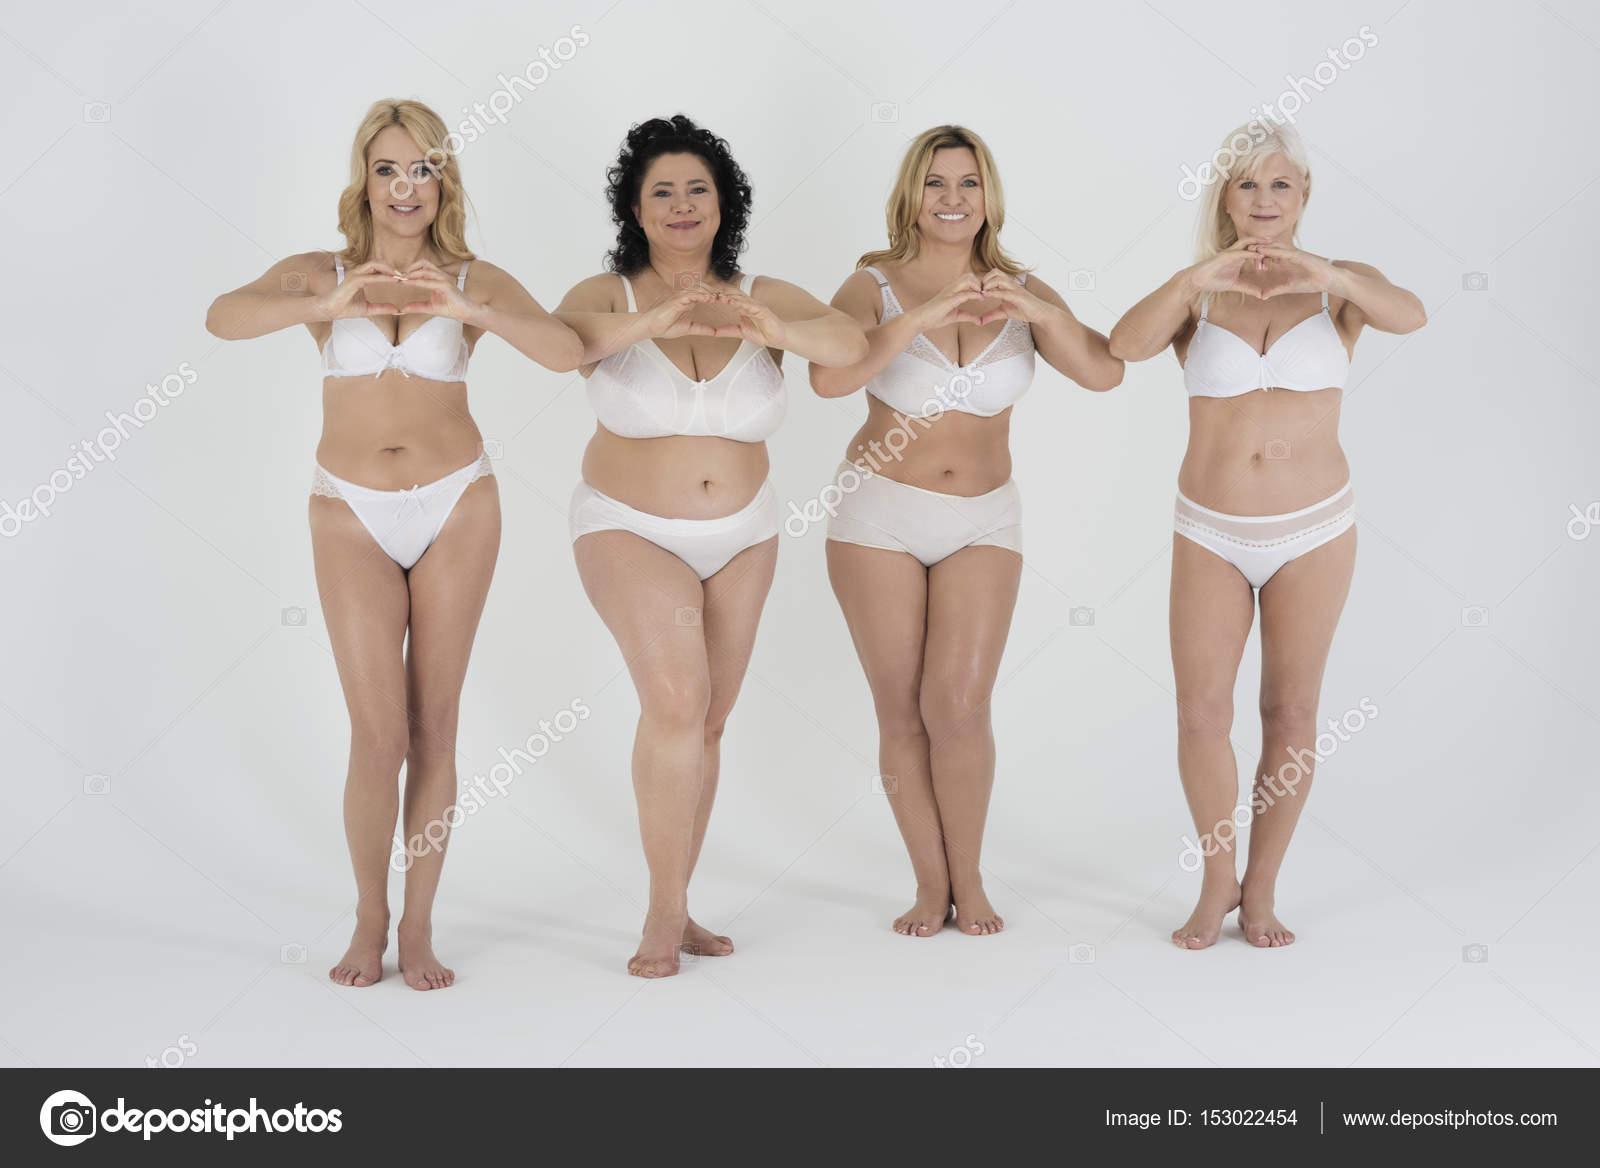 mature women in classic lingerie — stock photo © gpointstudio #153022454